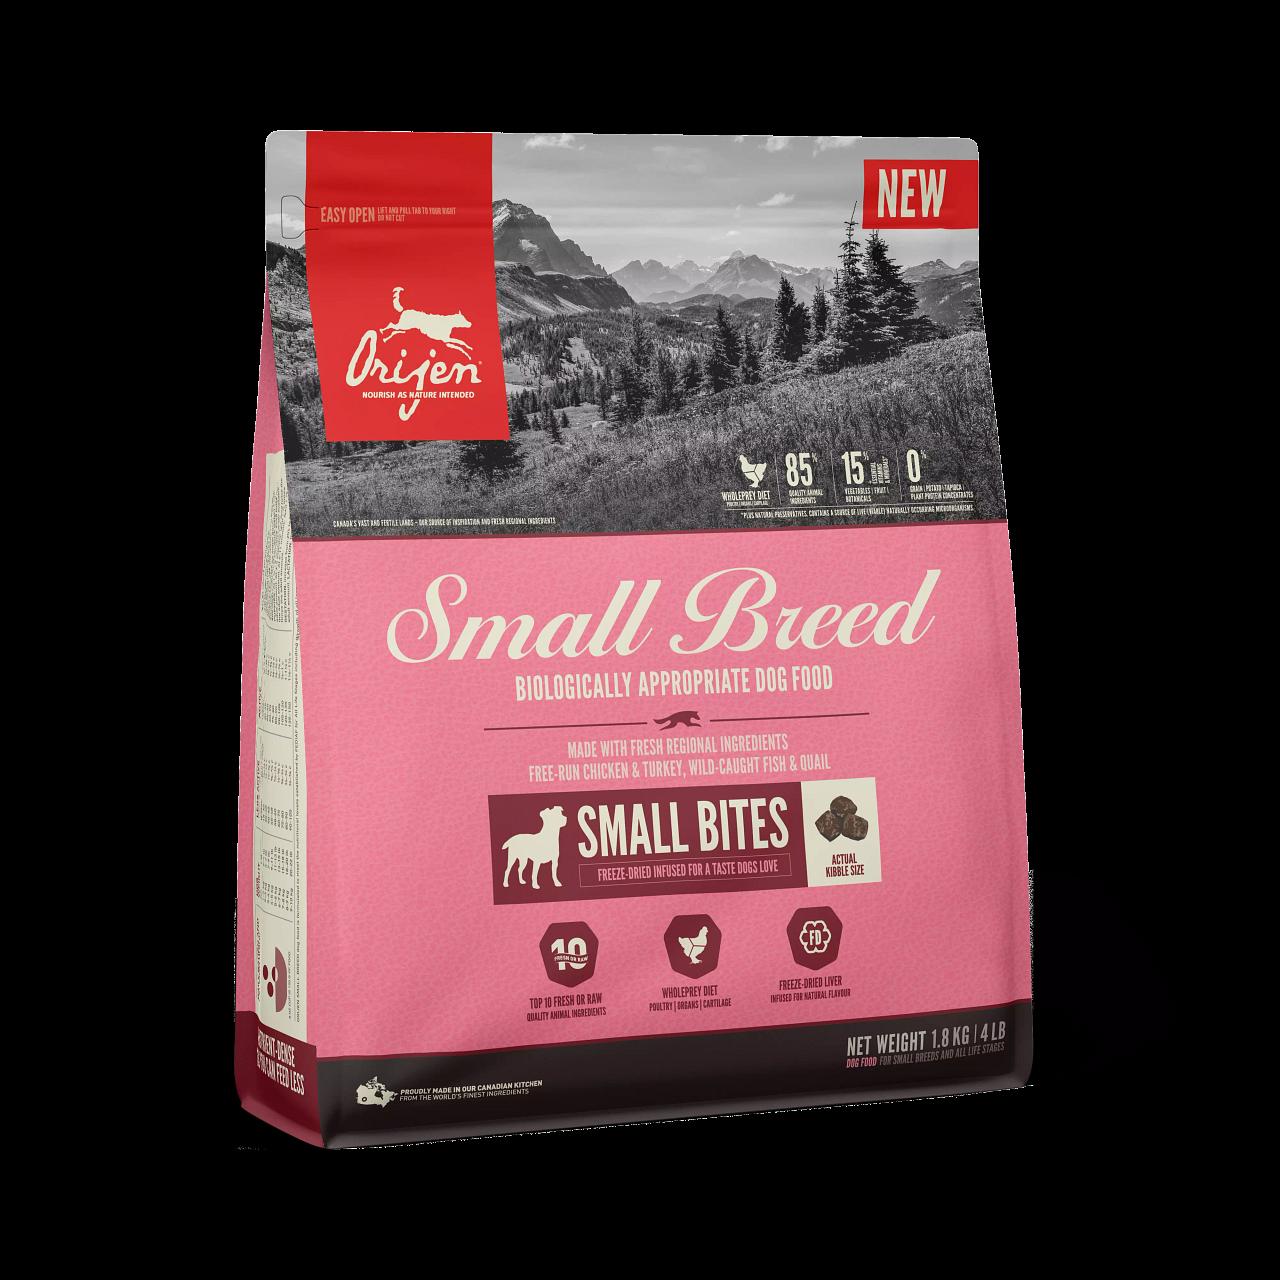 ORIJEN SMALL BITES FOR SMALL BREED 1.8KG